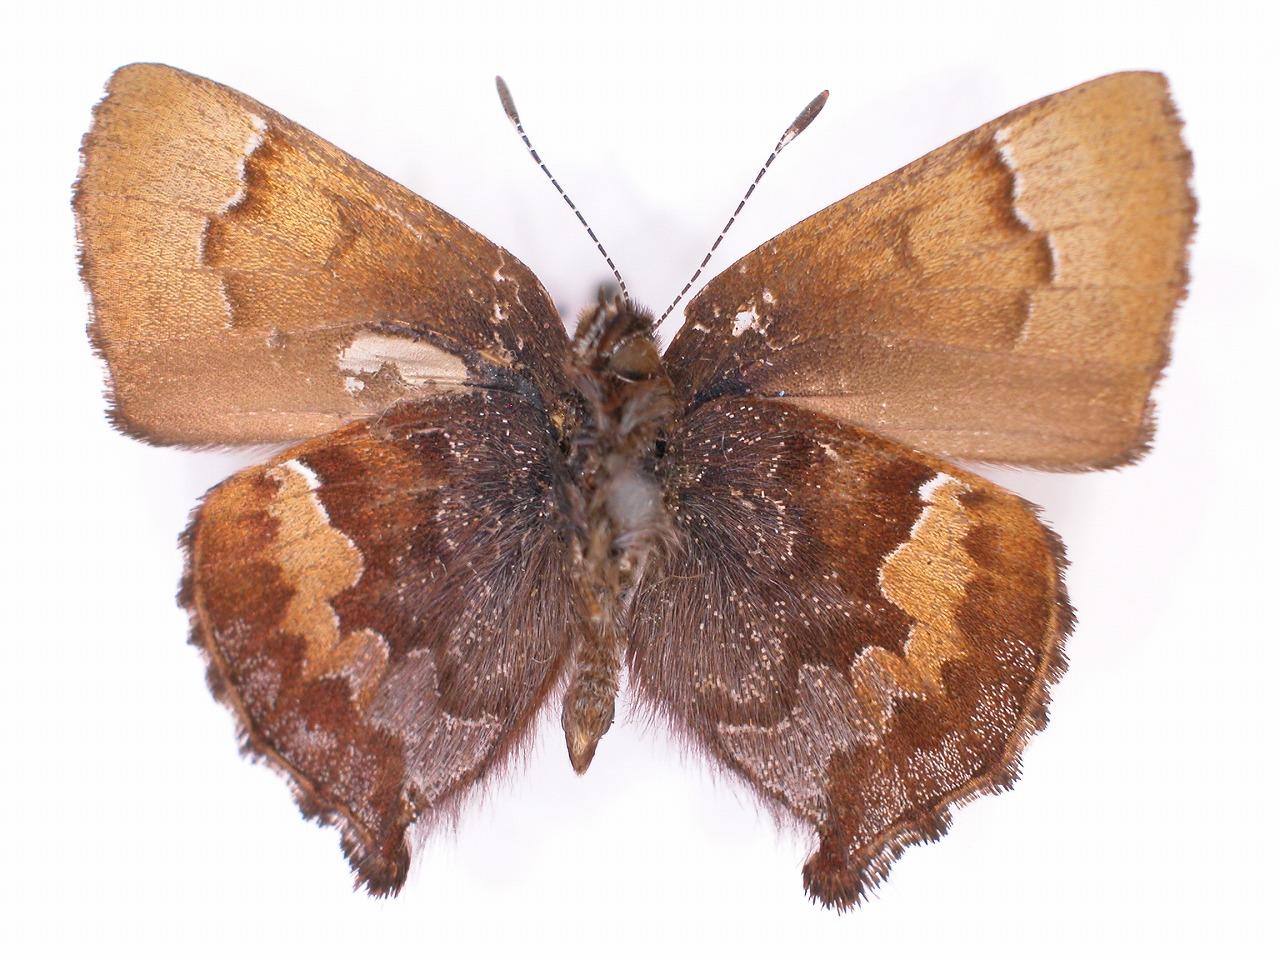 https://www.hitohaku.jp/material/l-material/butterfly-wing/5-lycaenidae/B1-637727_B.jpg